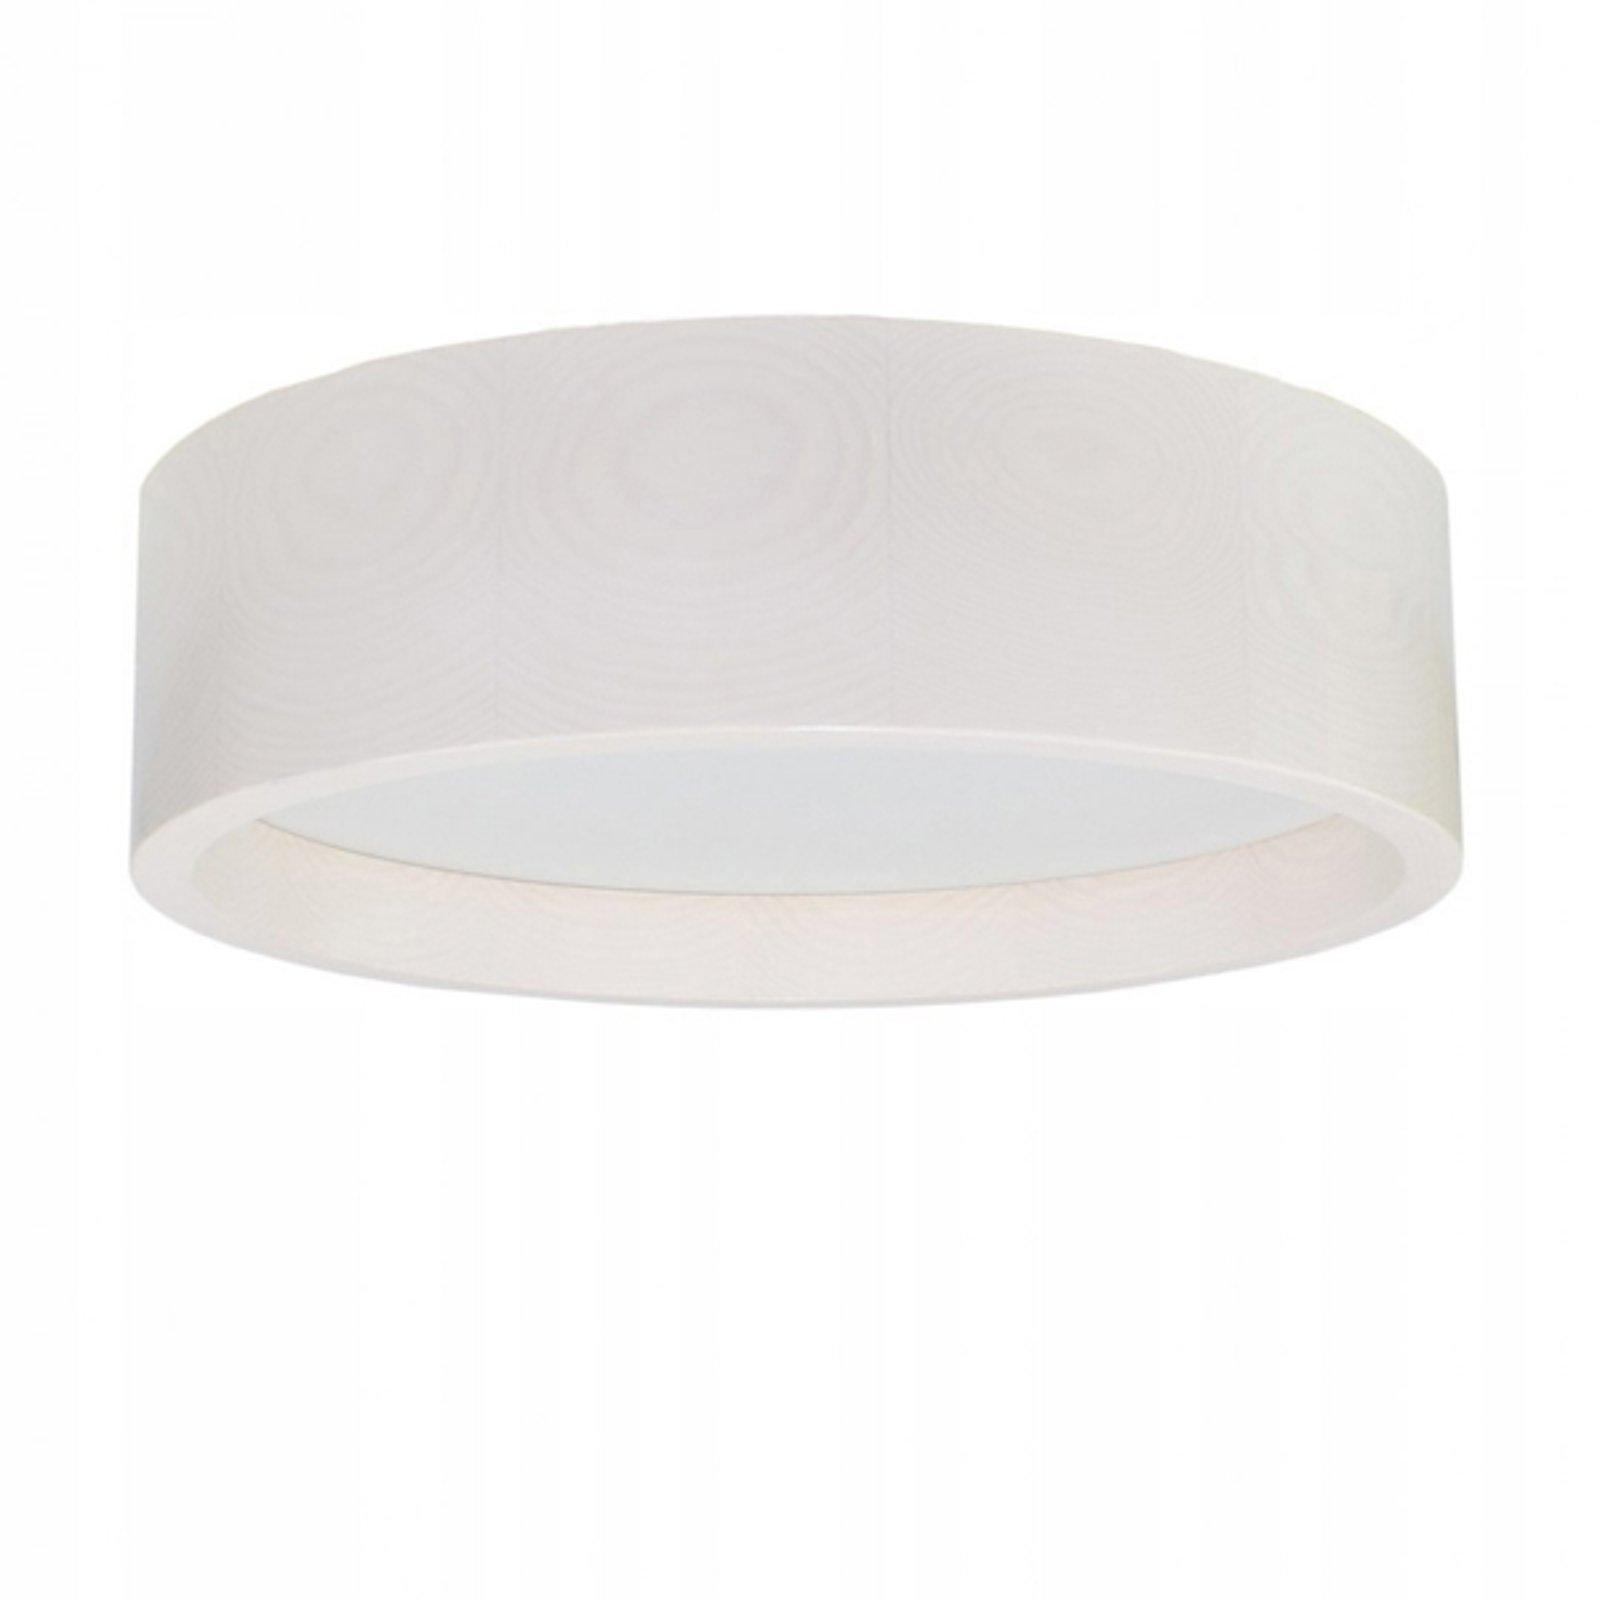 LED-taklampe Deep, Ø 38 cm, hvit